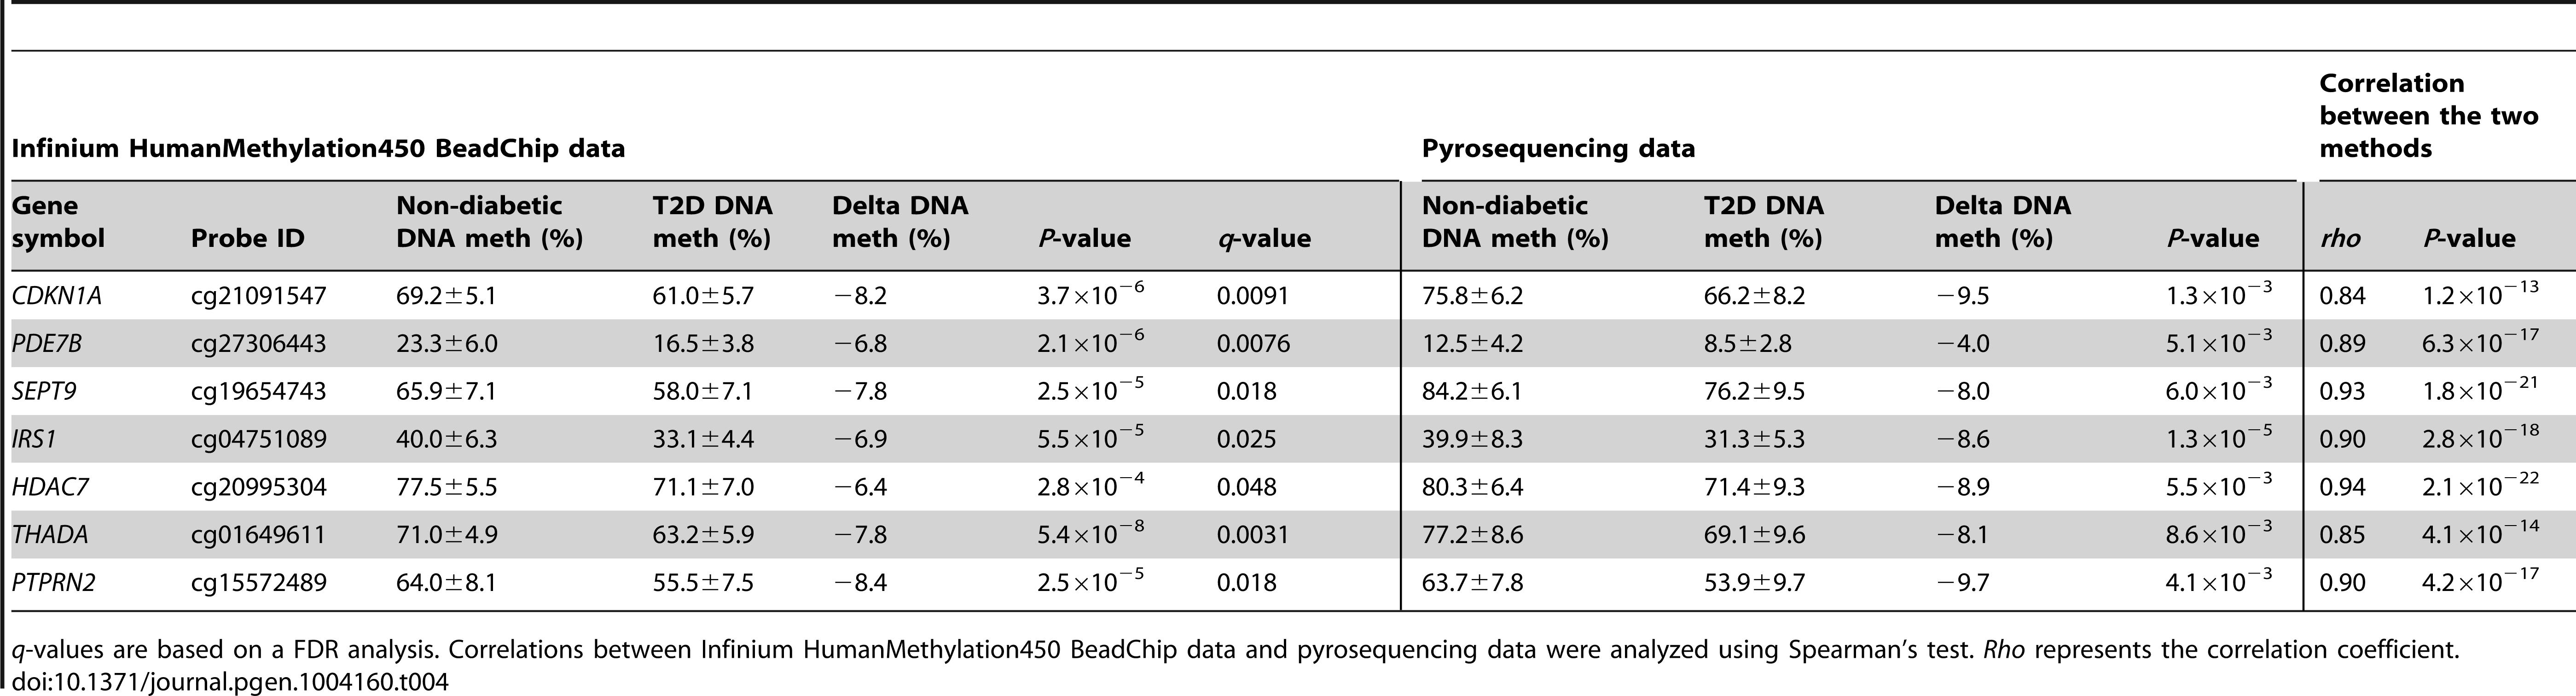 Technical validation of Infinium HumanMethylation450 BeadChip data using pyrosequencing.